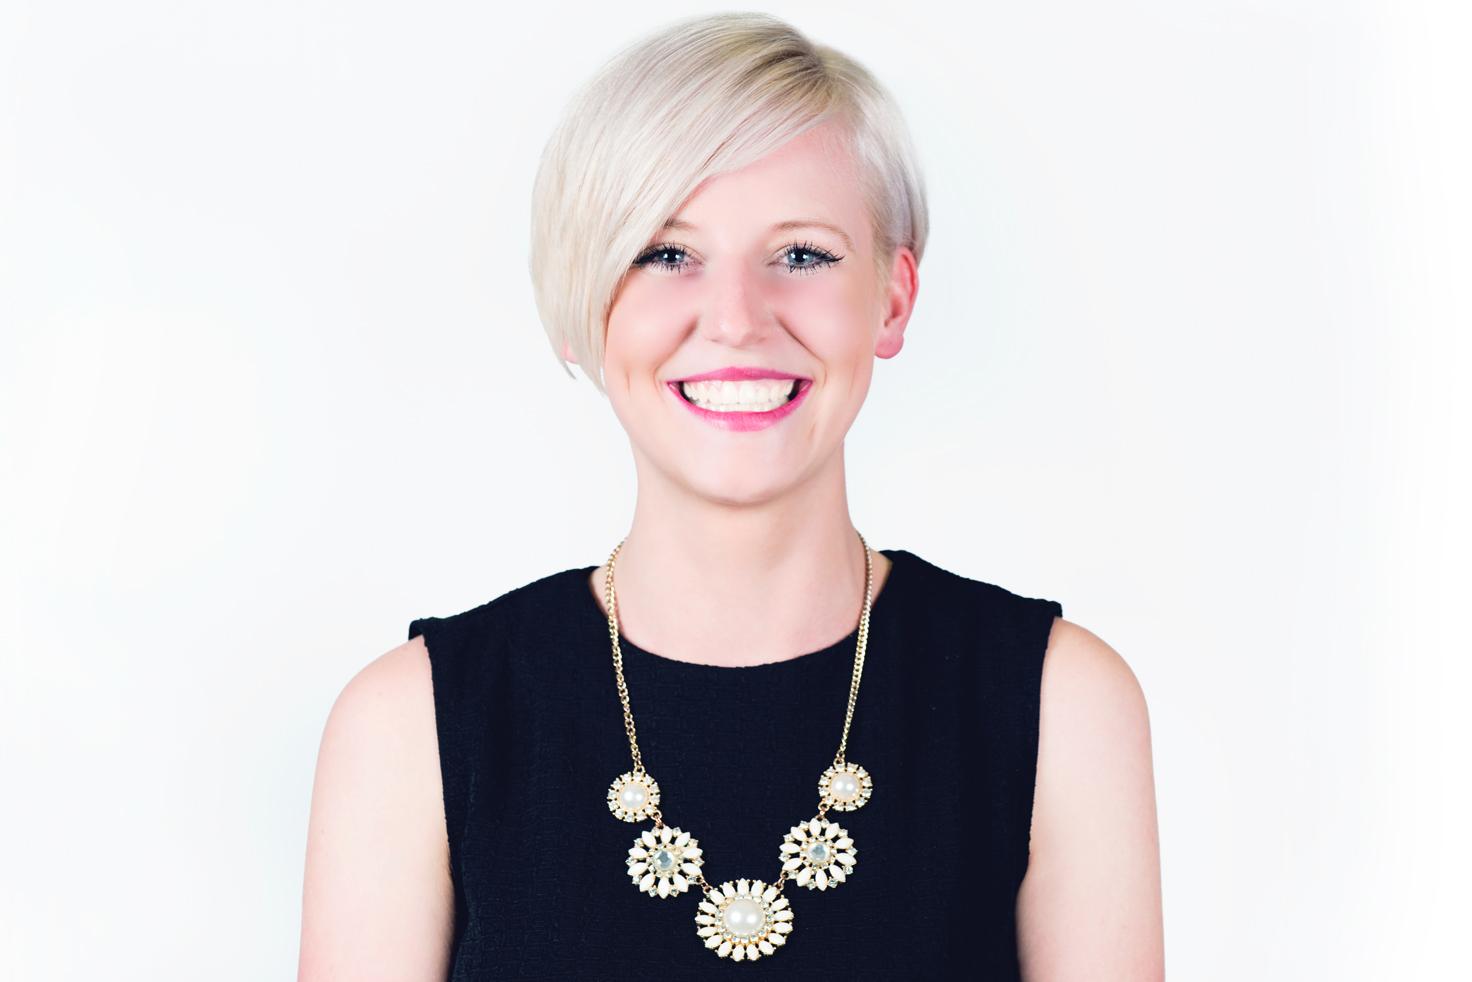 Business - Headshots, Team & Promotional Capture